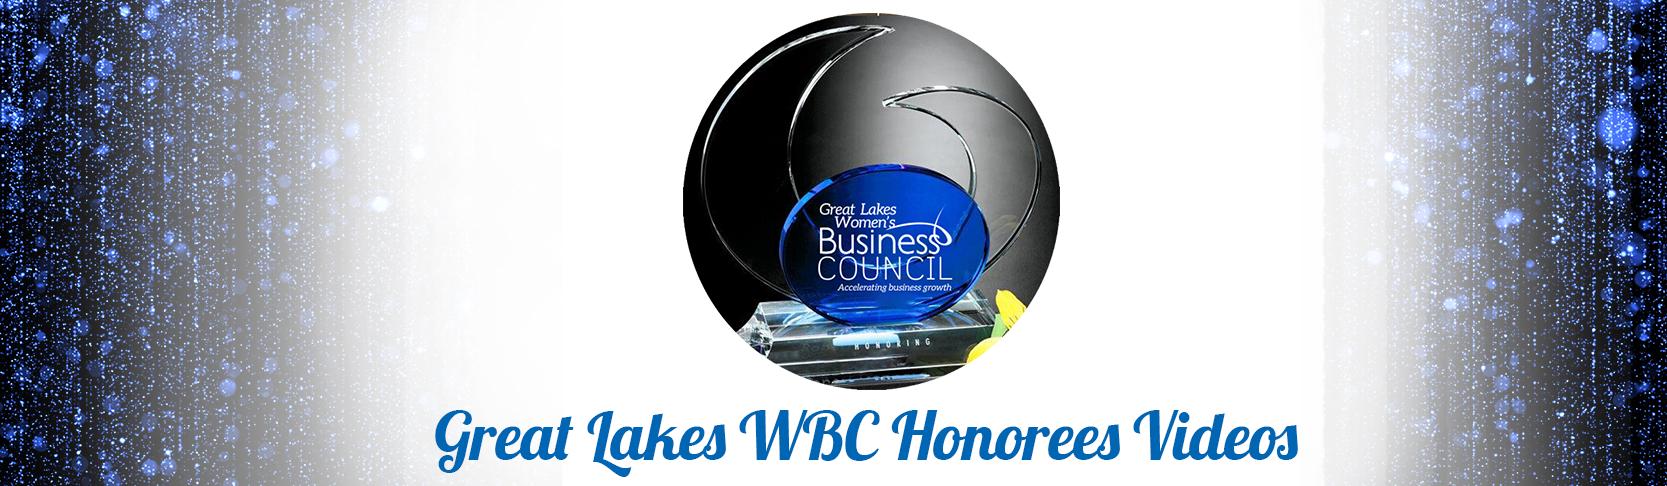 Great Lakes Awards Image